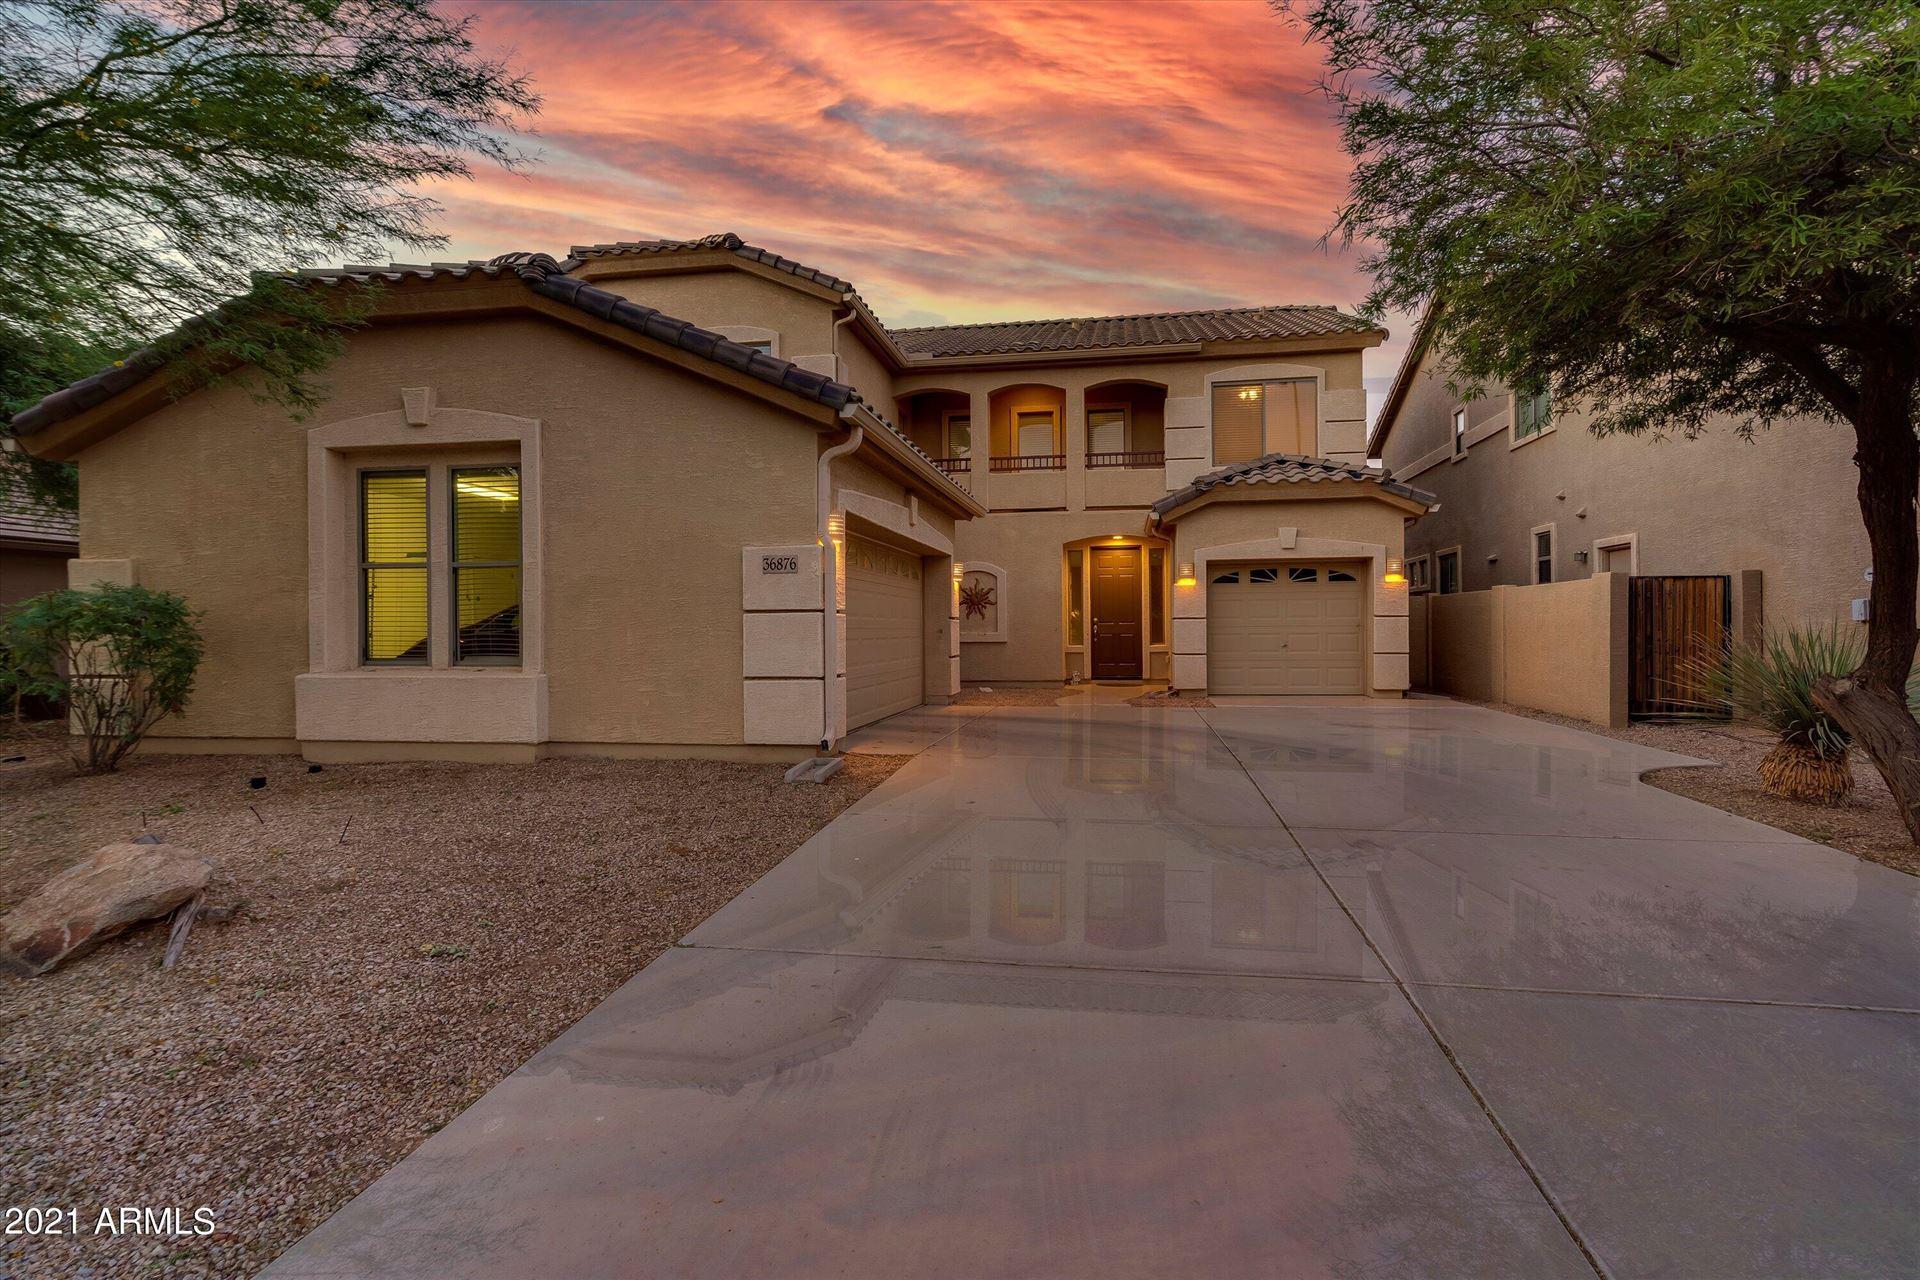 Photo of 36876 W OLIVETO Avenue, Maricopa, AZ 85138 (MLS # 6306940)